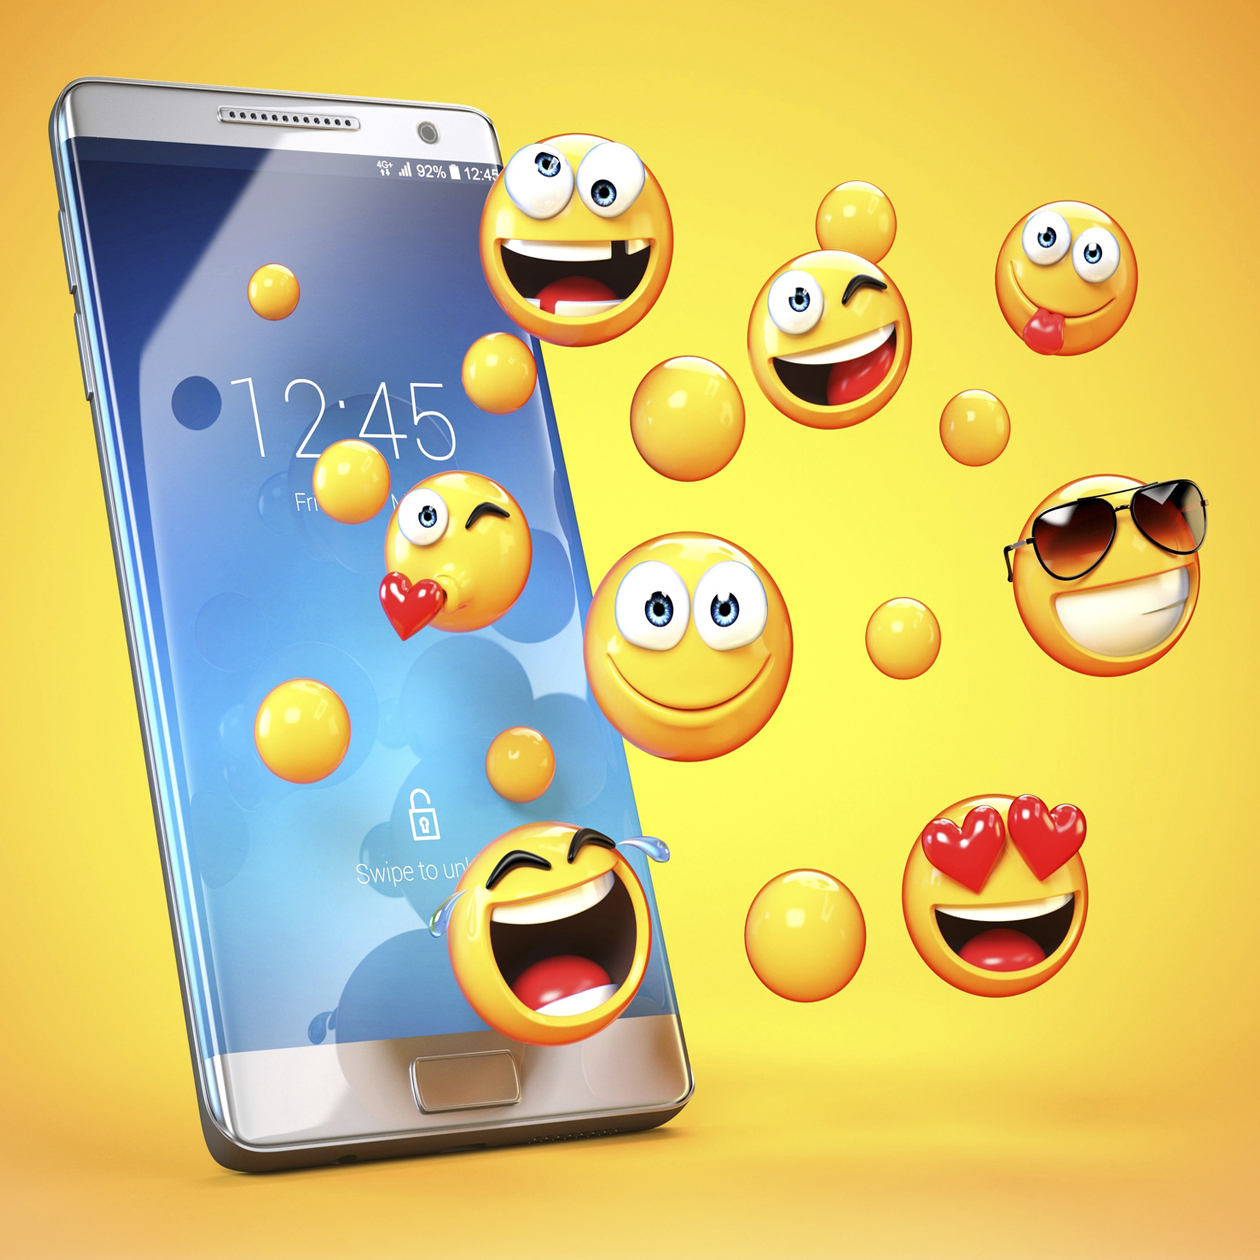 emojit hyppivät ulos älypuhelimesta